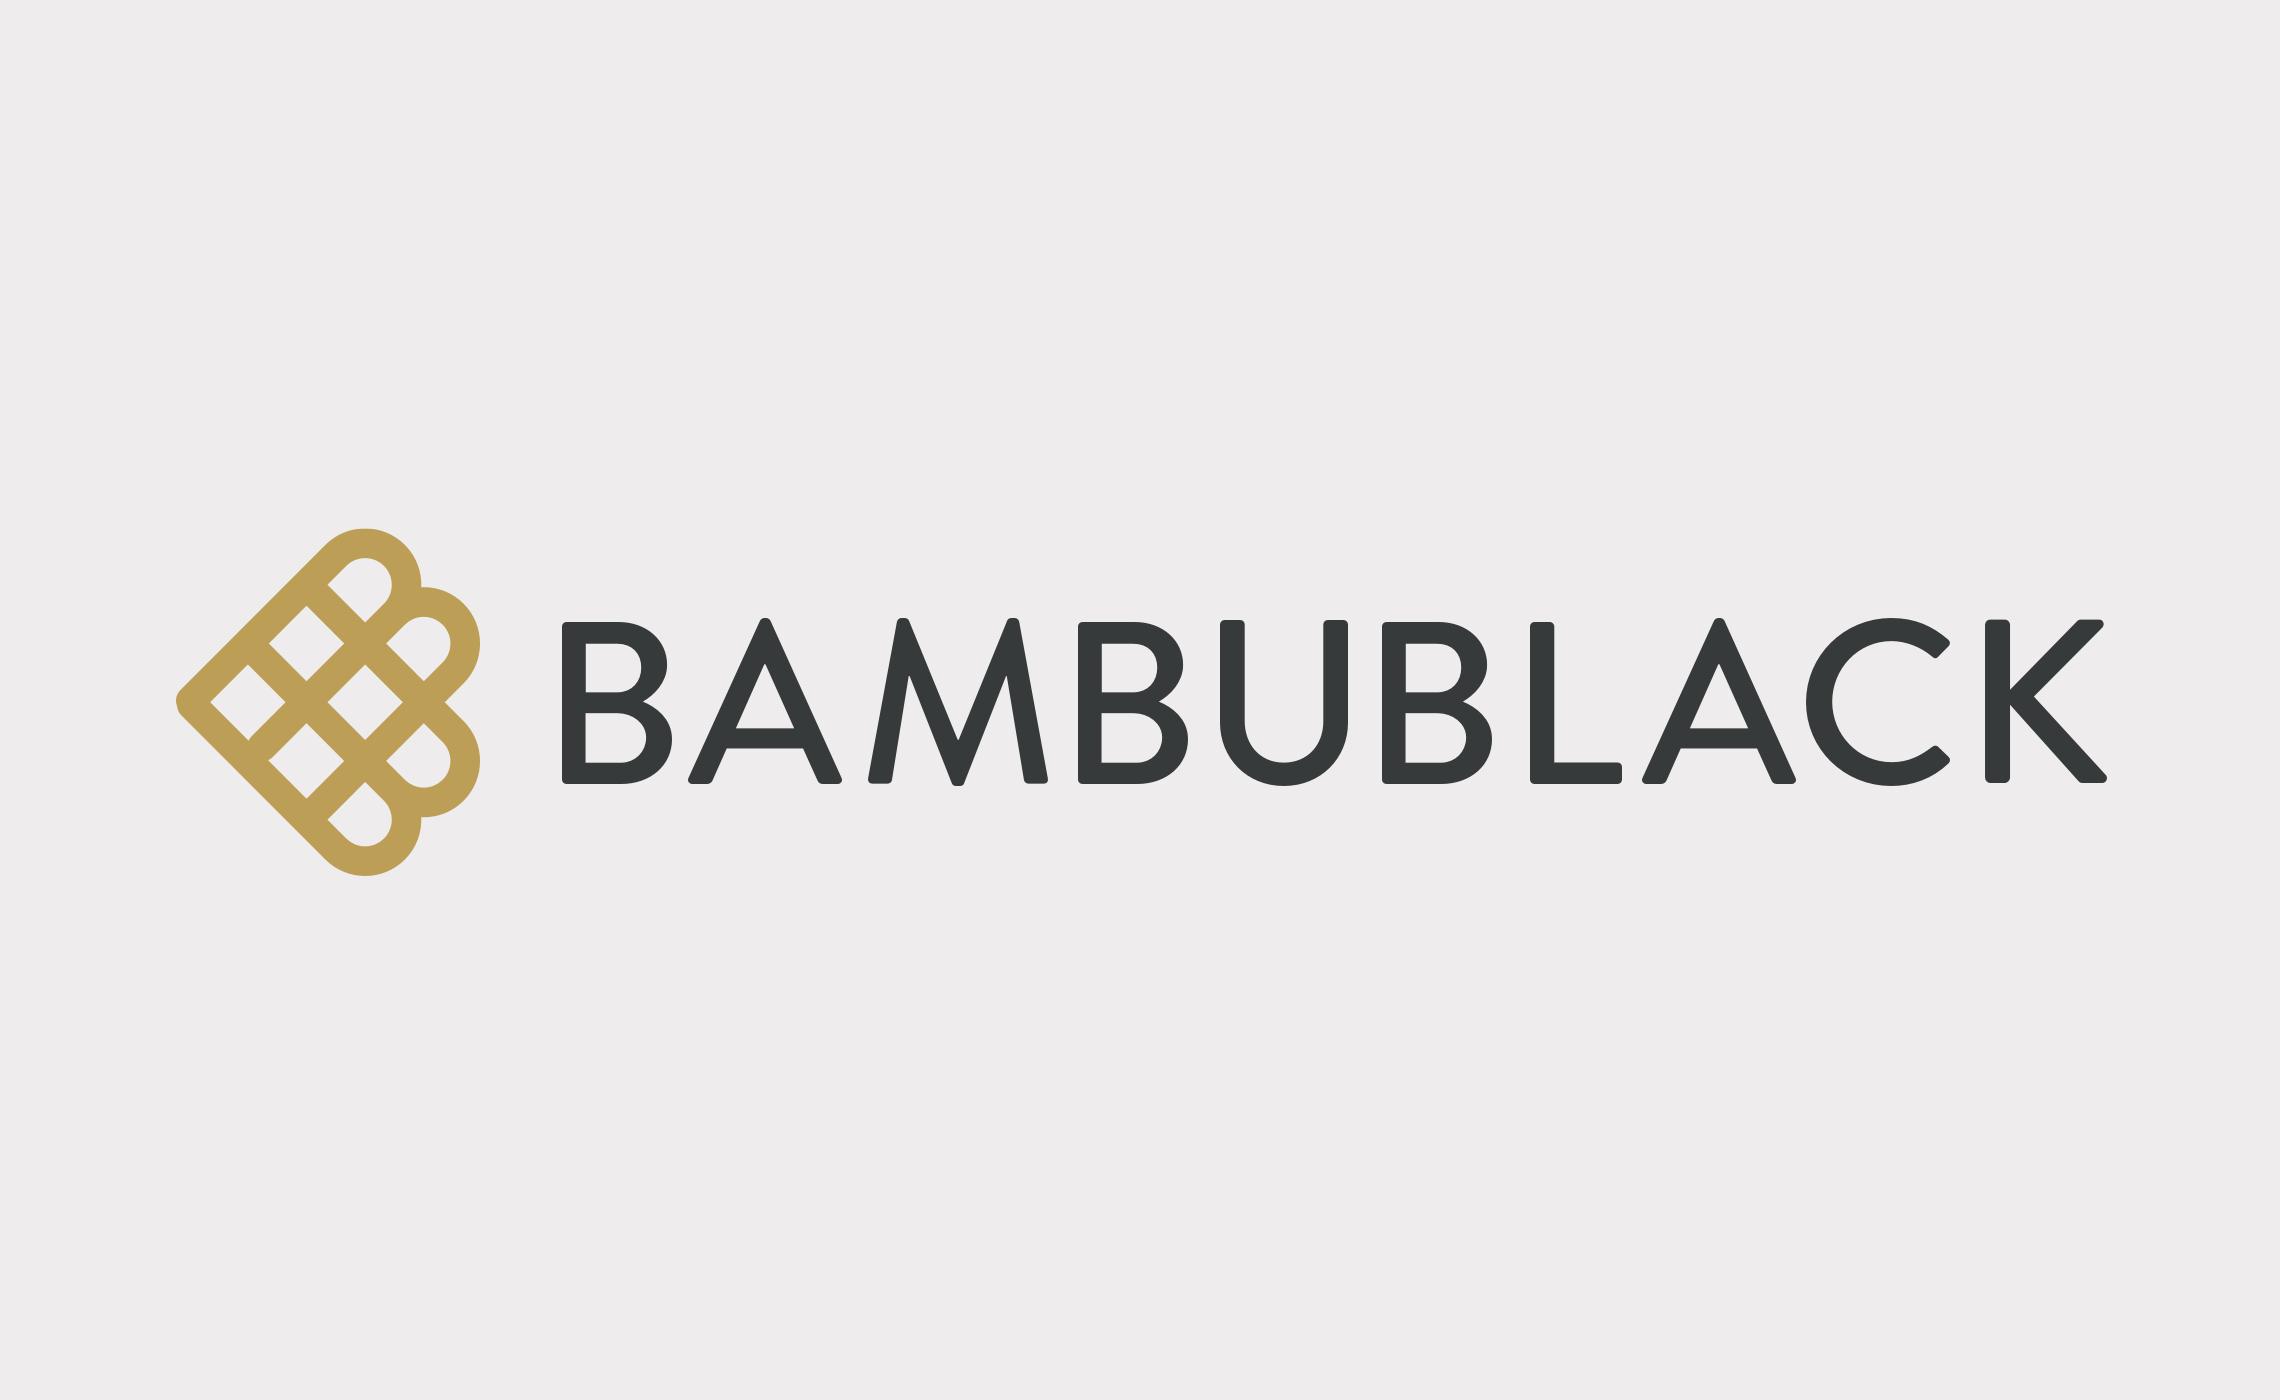 BambuBlack - logo